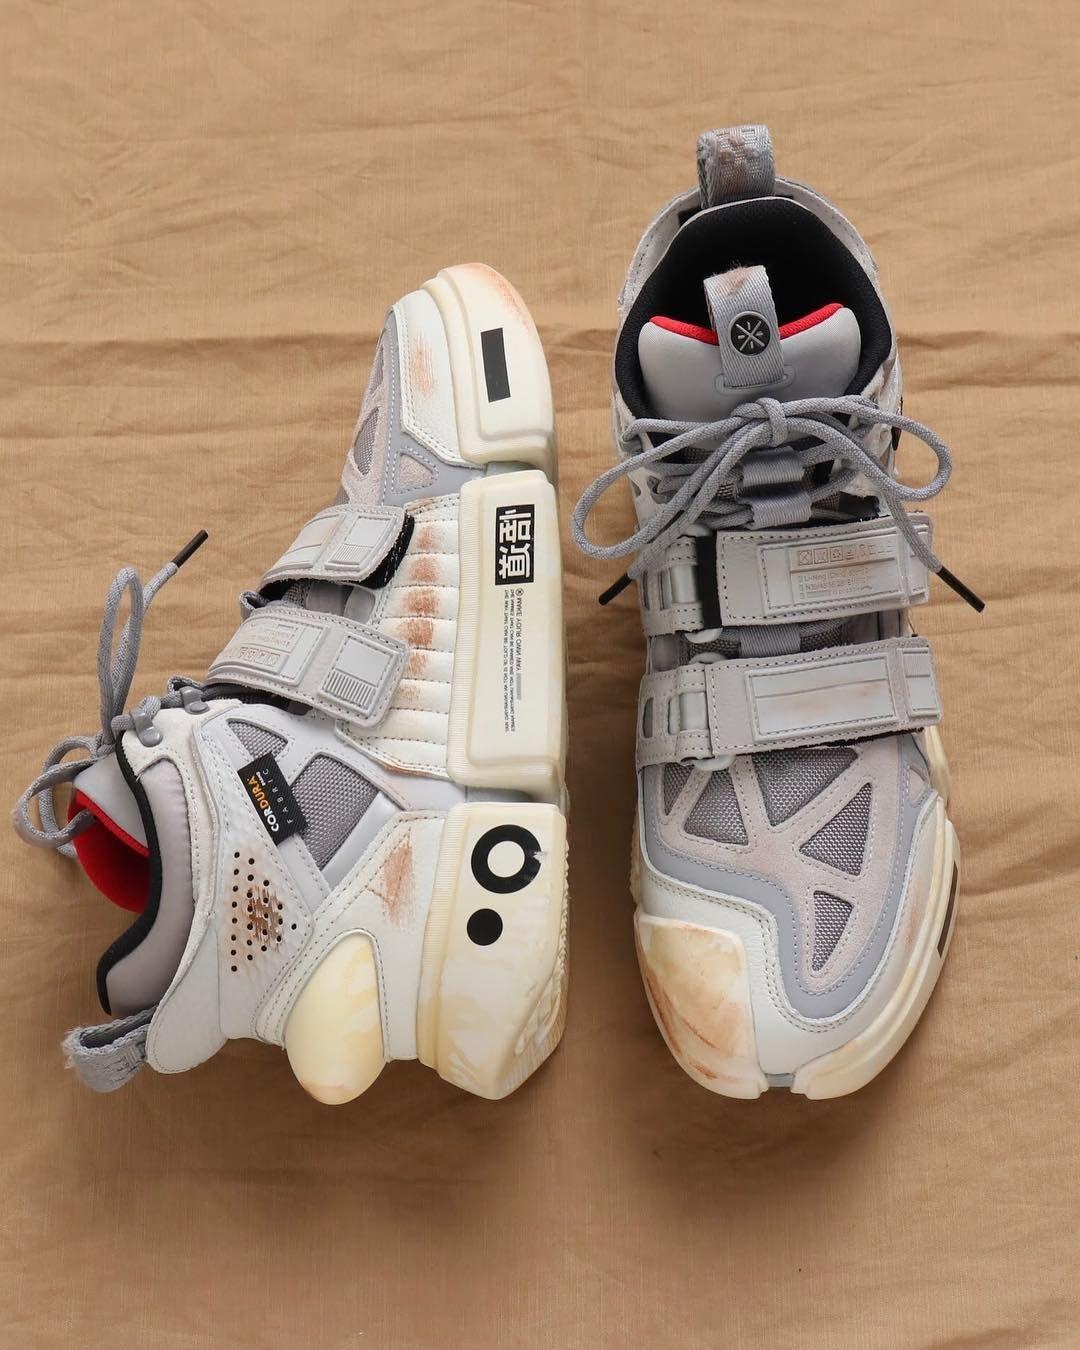 Atmos Japan Official On Instagram Li Ning は中国の有数な大手スポーツブランドである 自ら世界クラス体操選手であった創業者李寧 Li Ning の姓名をブランドとして 1990年創立された 今年 At ドレスシューズ メンズ シューズ ファッション スニーカー